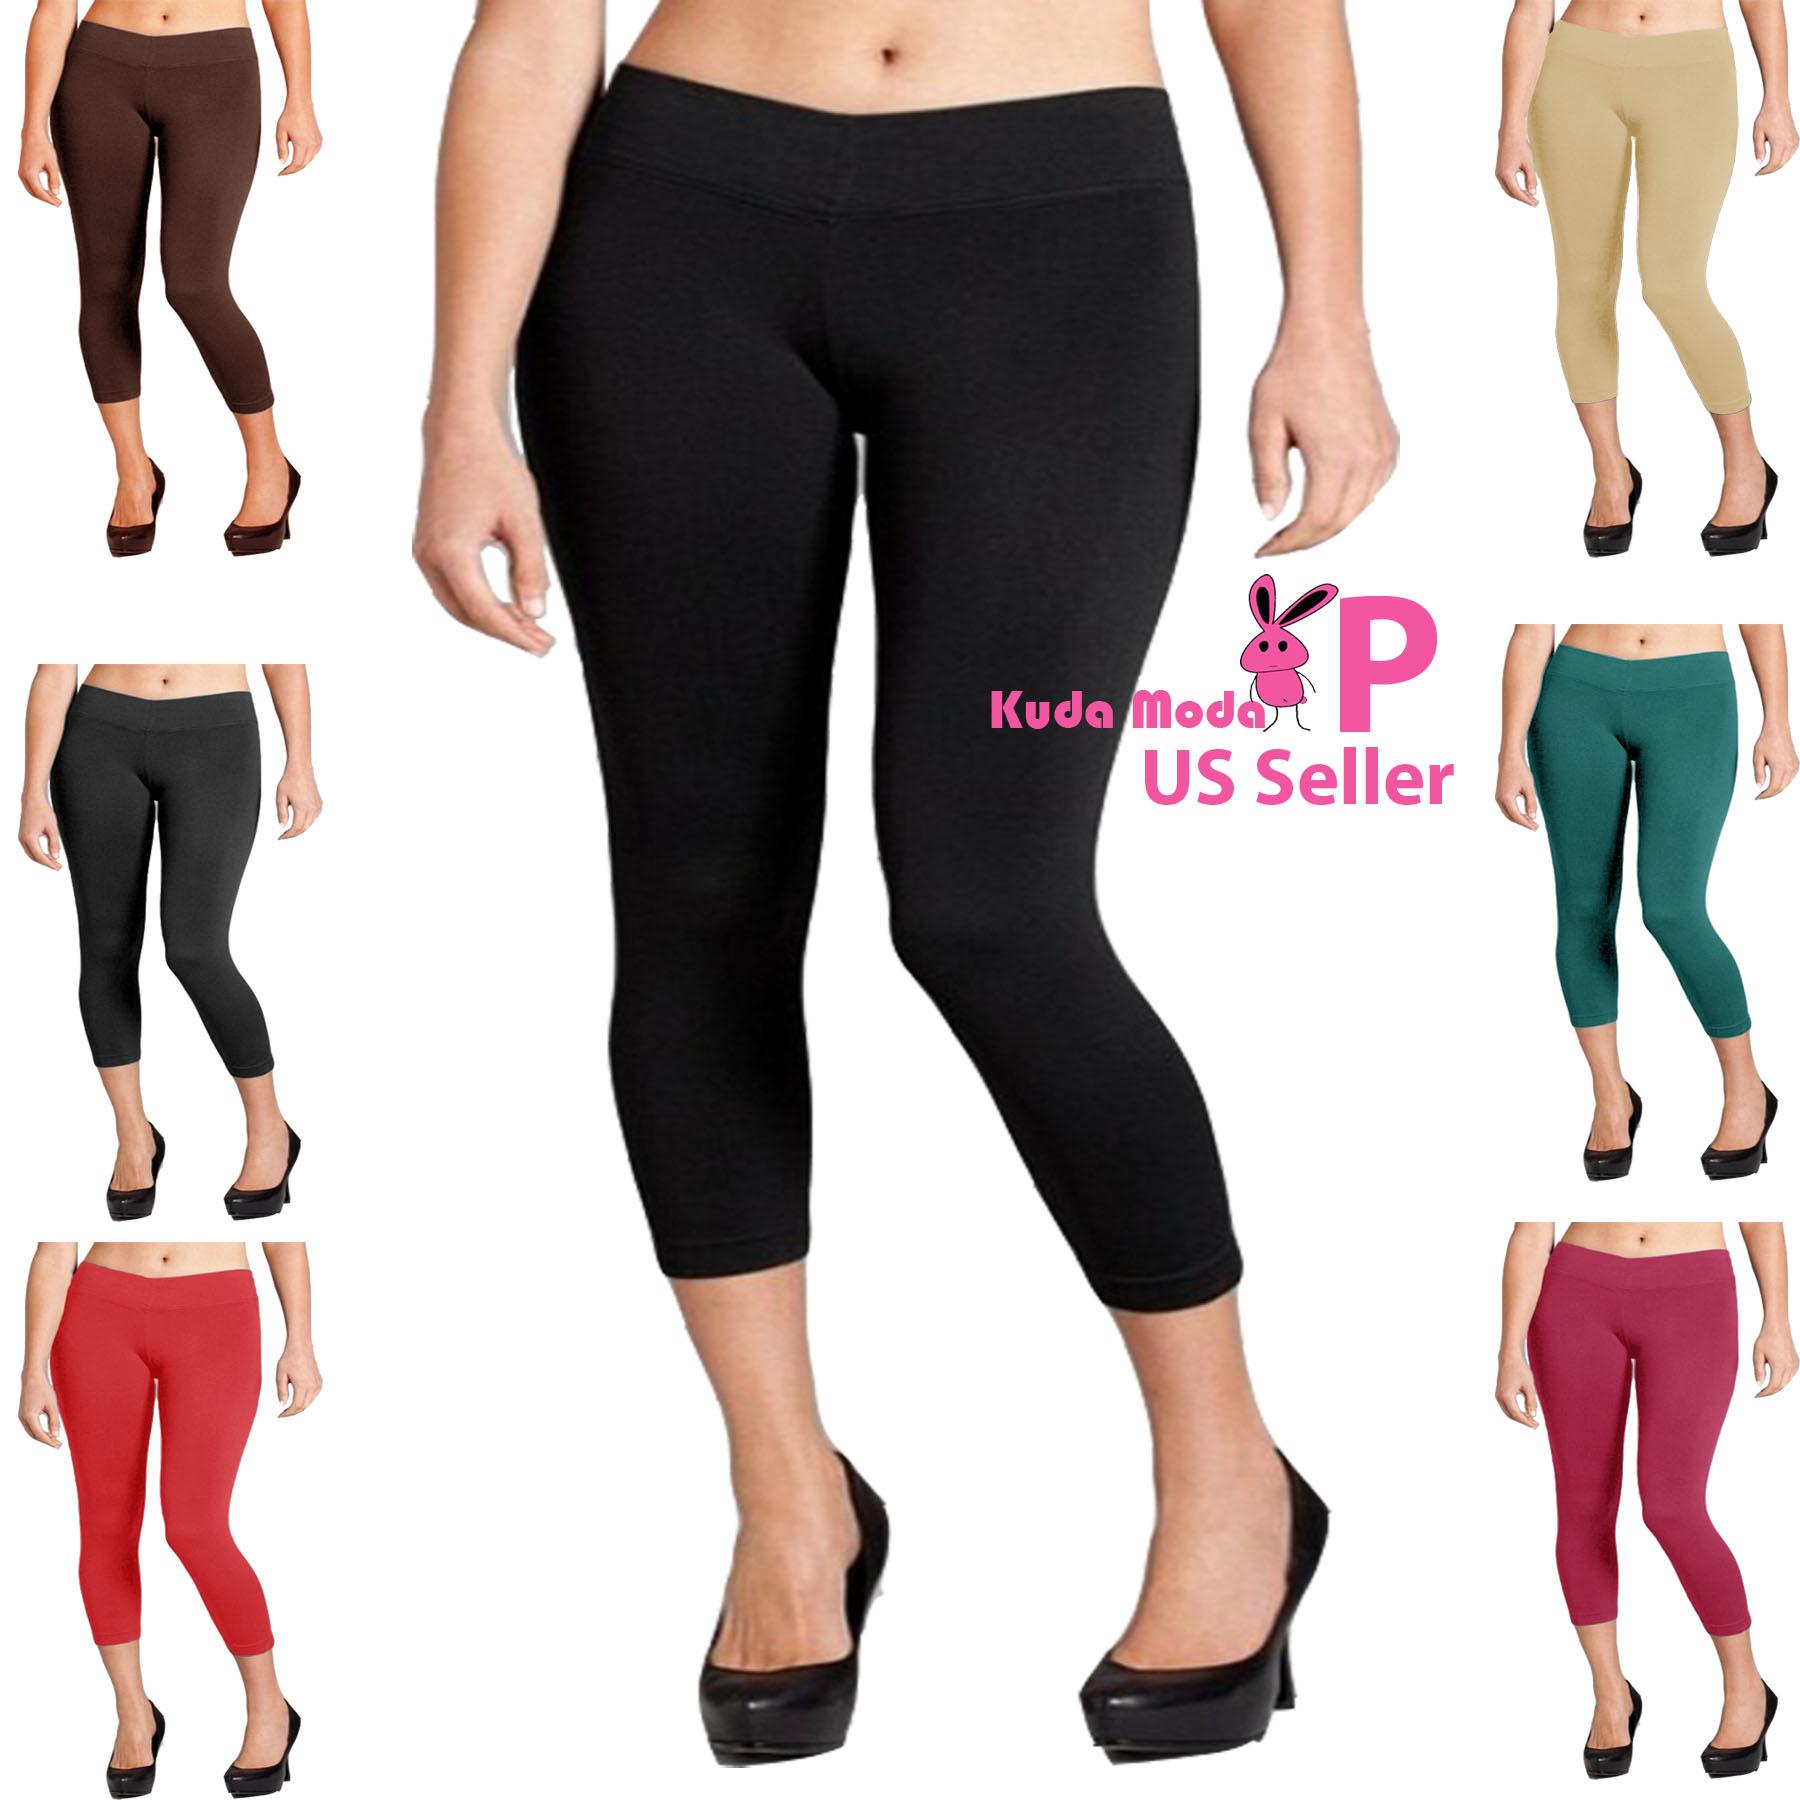 Seamless Spandex Capri Stretch Leggings Basic Mid Calf Tight Long Pants One Size